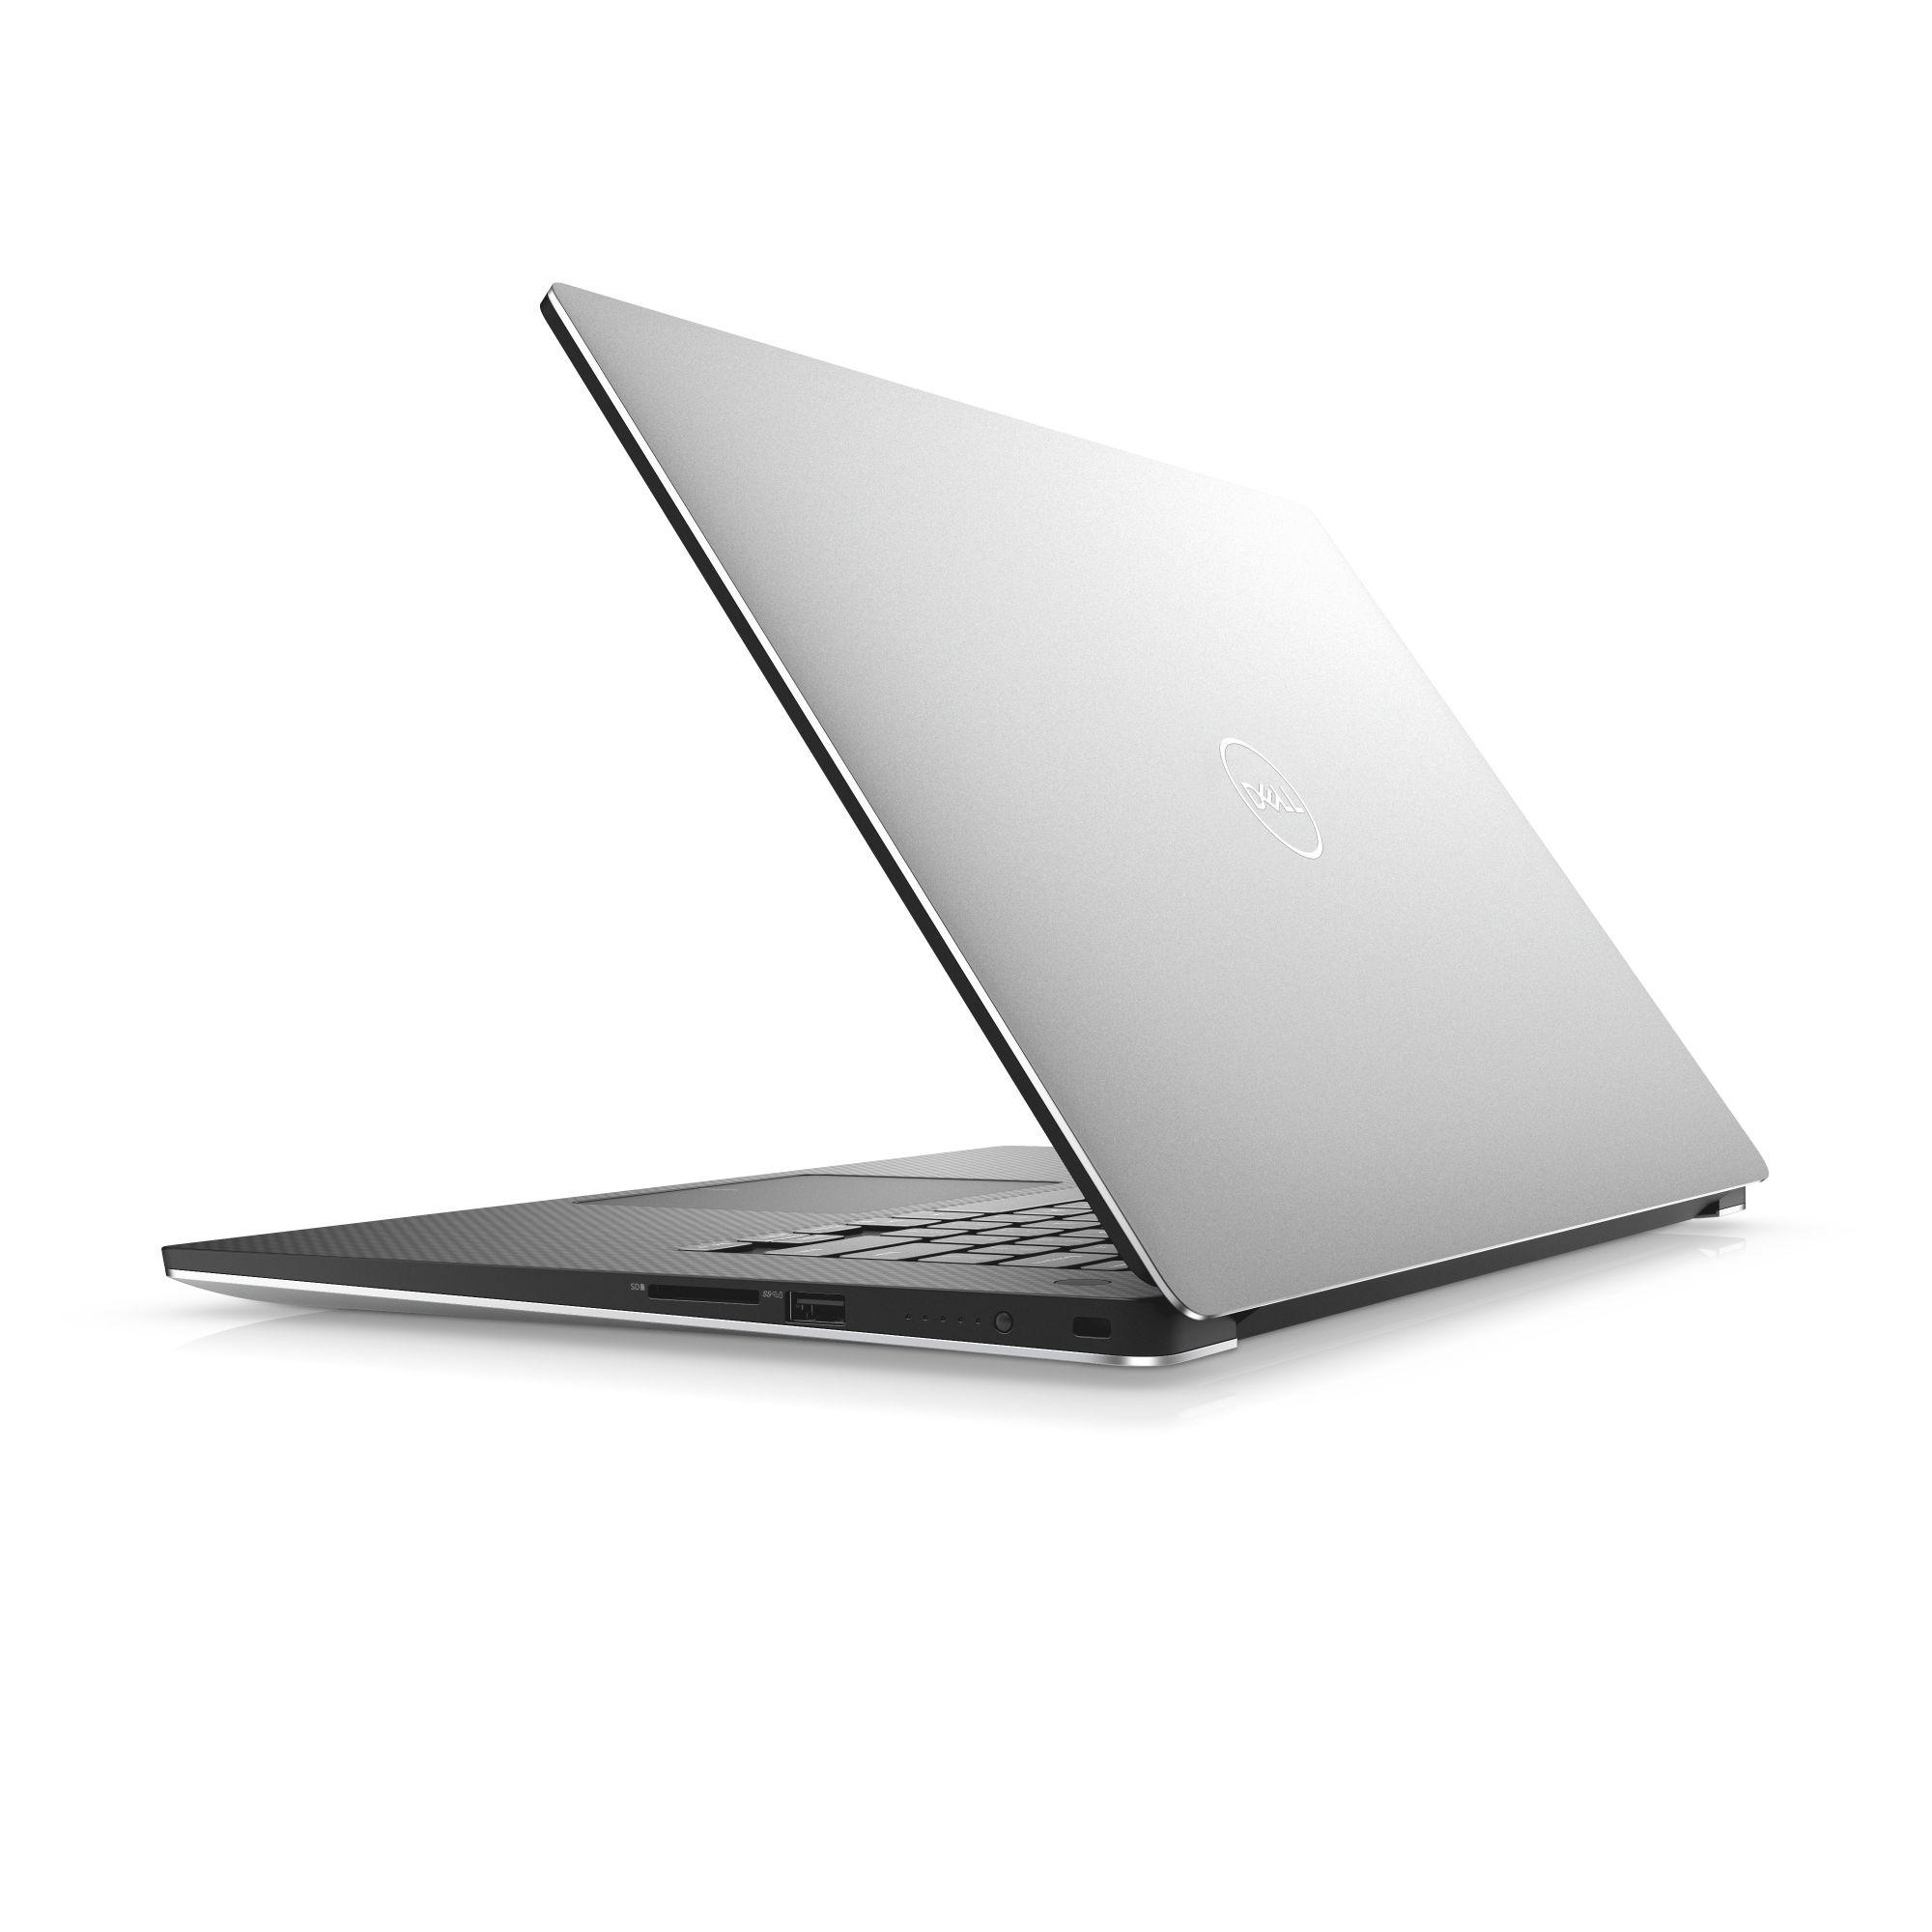 Dell Precision 5530 15'' FHD i7-8850H/16GB/512GB SSD/P2000-4GB/THB/MCR/HDMI/W10P/3RNBD/Stříbrný